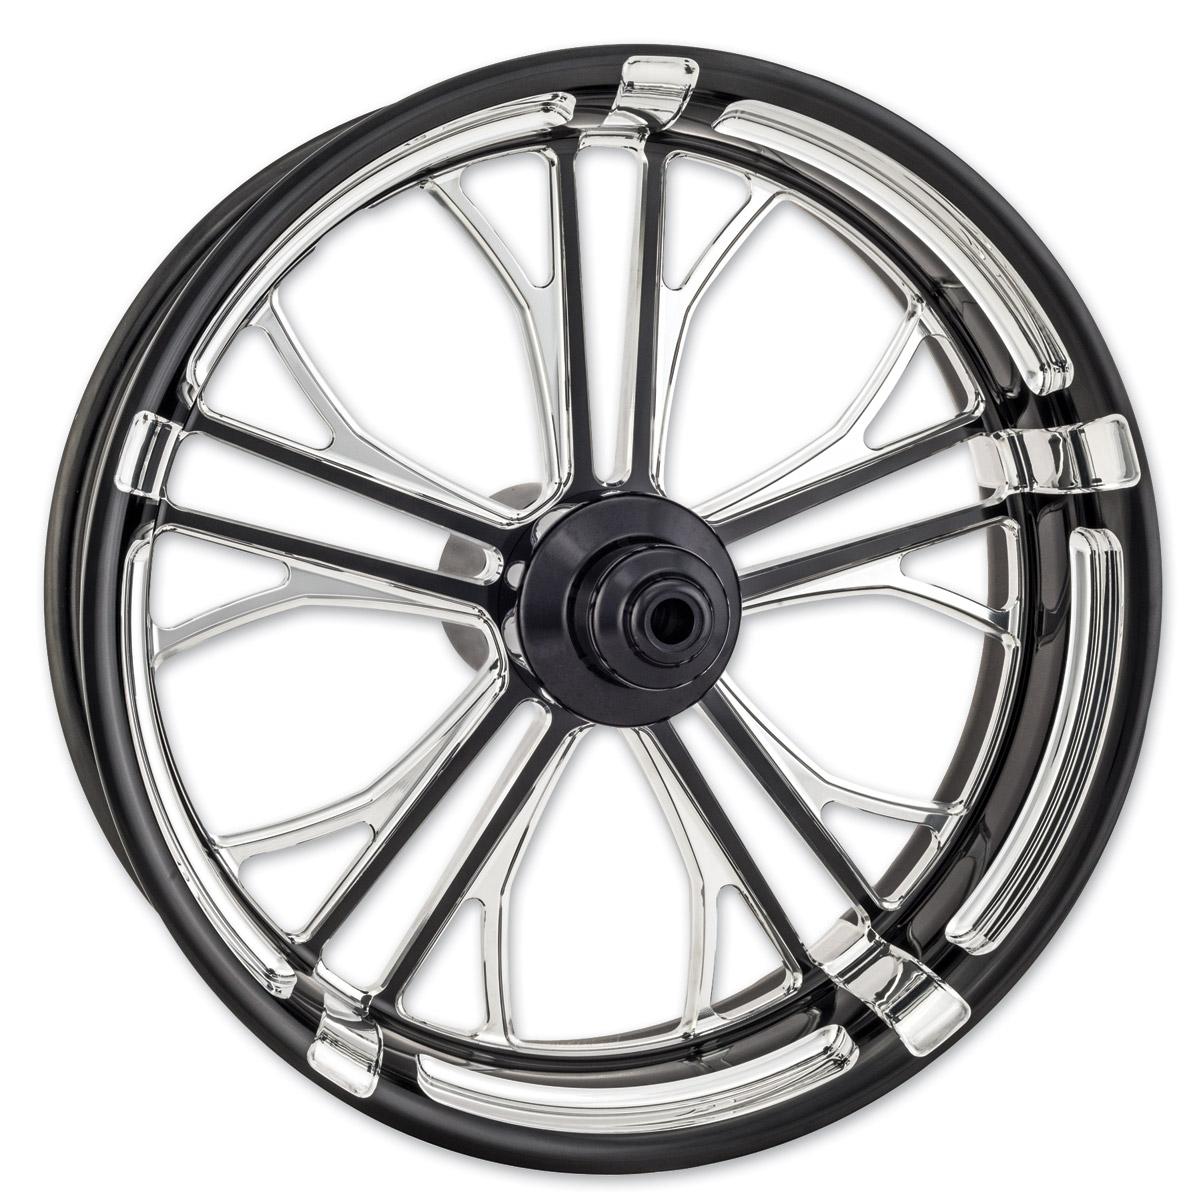 Performance Machine Contrast Cut Platinum Forged Dixon Rear Wheel, 18